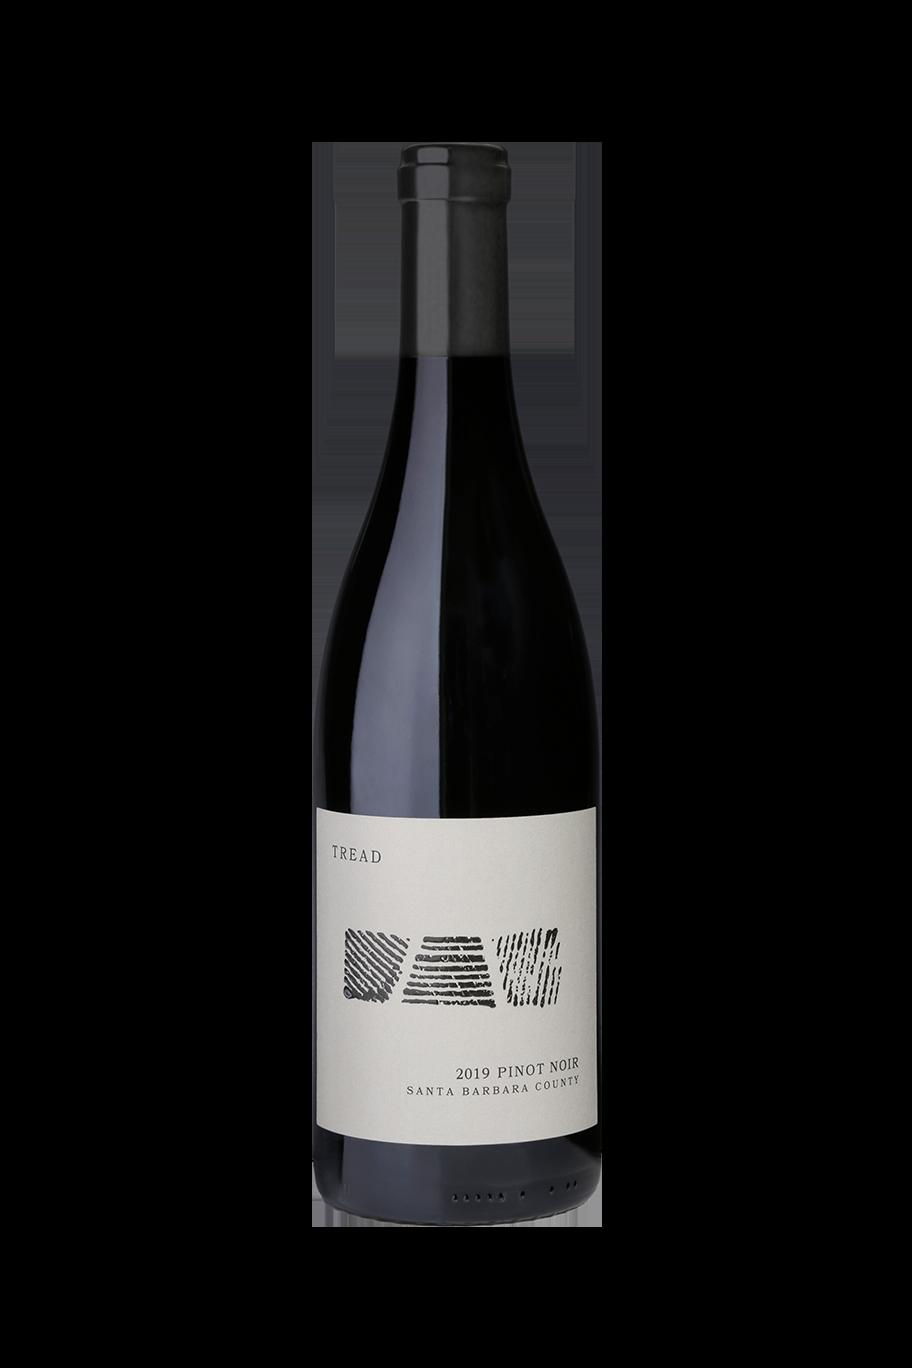 2019 TREAD SBC Pinot Noir Bottle Shot